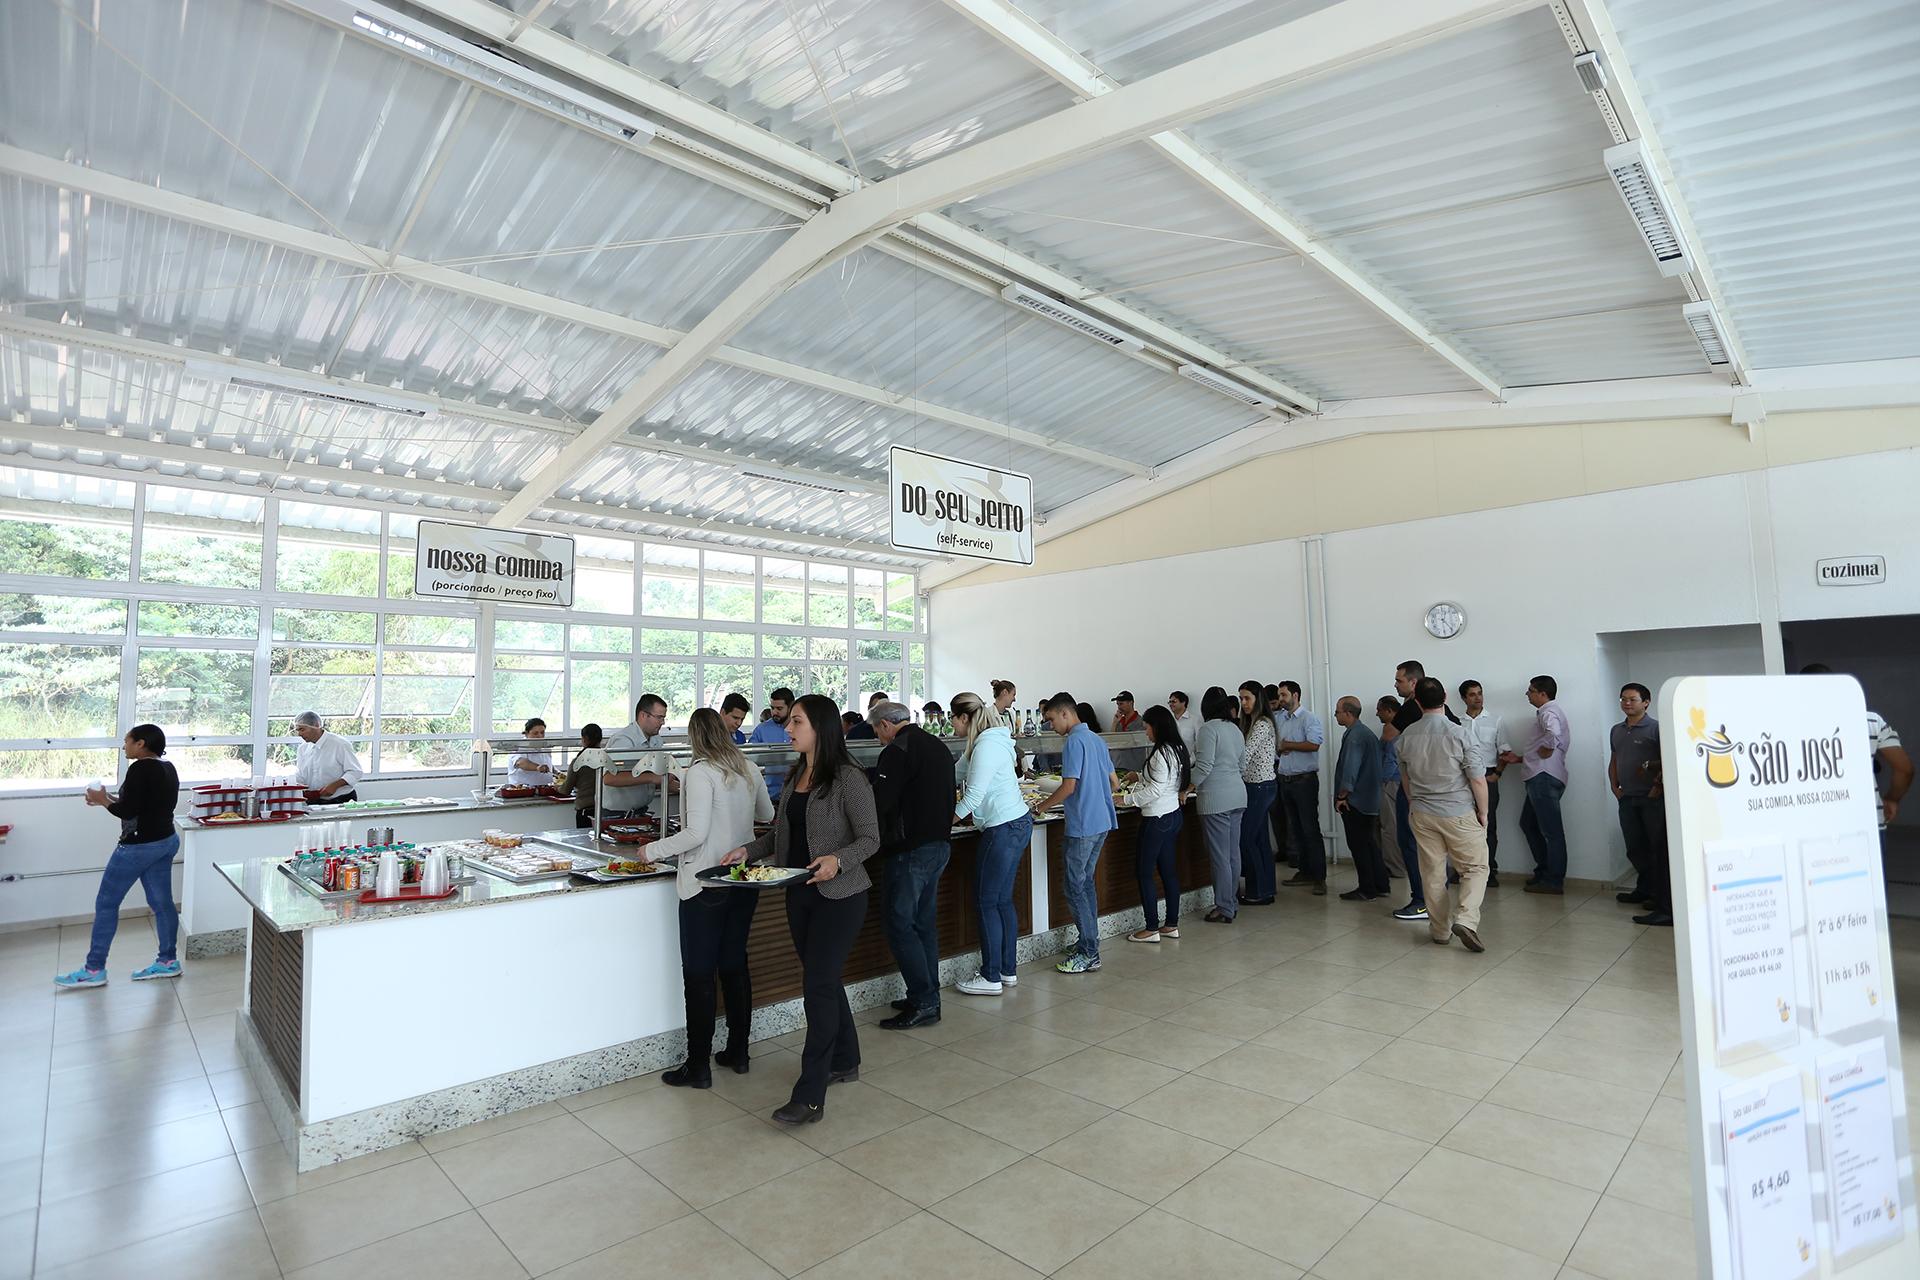 Restaurante Parque Industrial San Jose Wsavioli